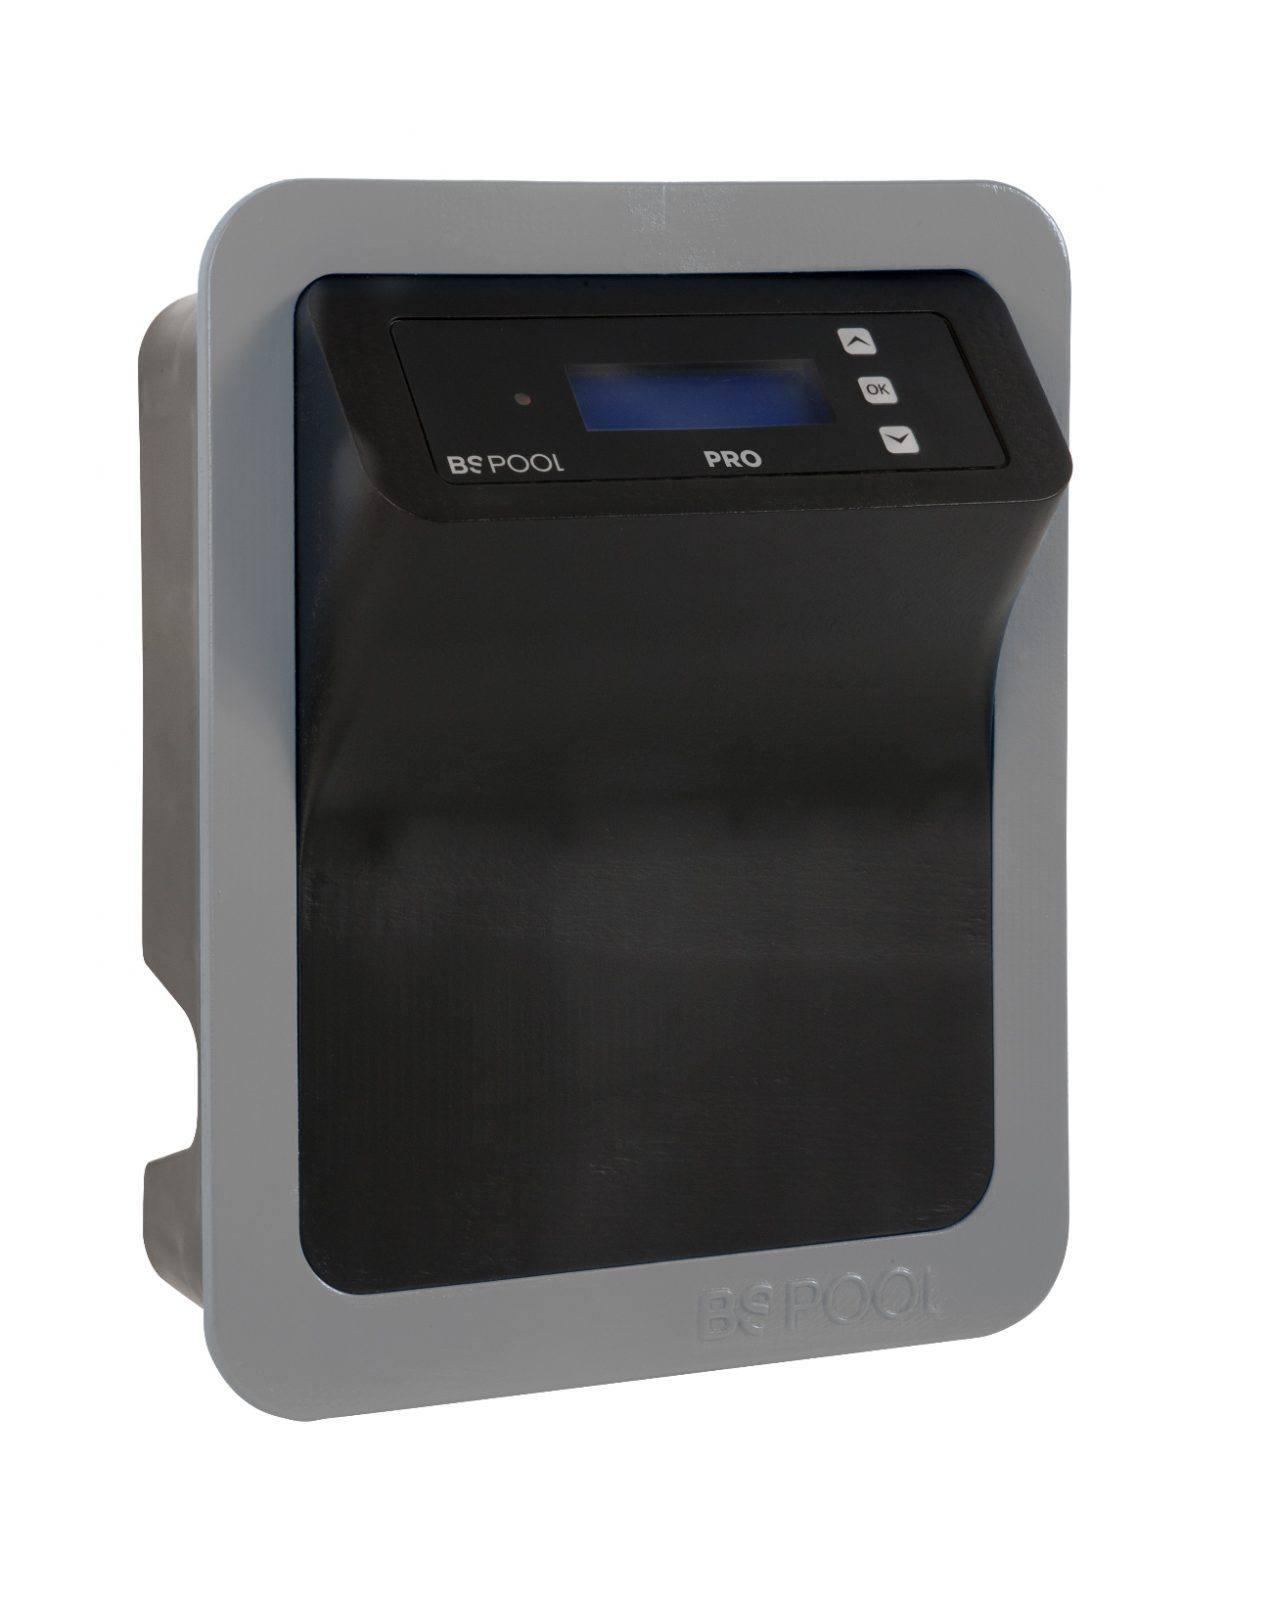 Clorador industrial BSPOOL PRO 50-70-100-150